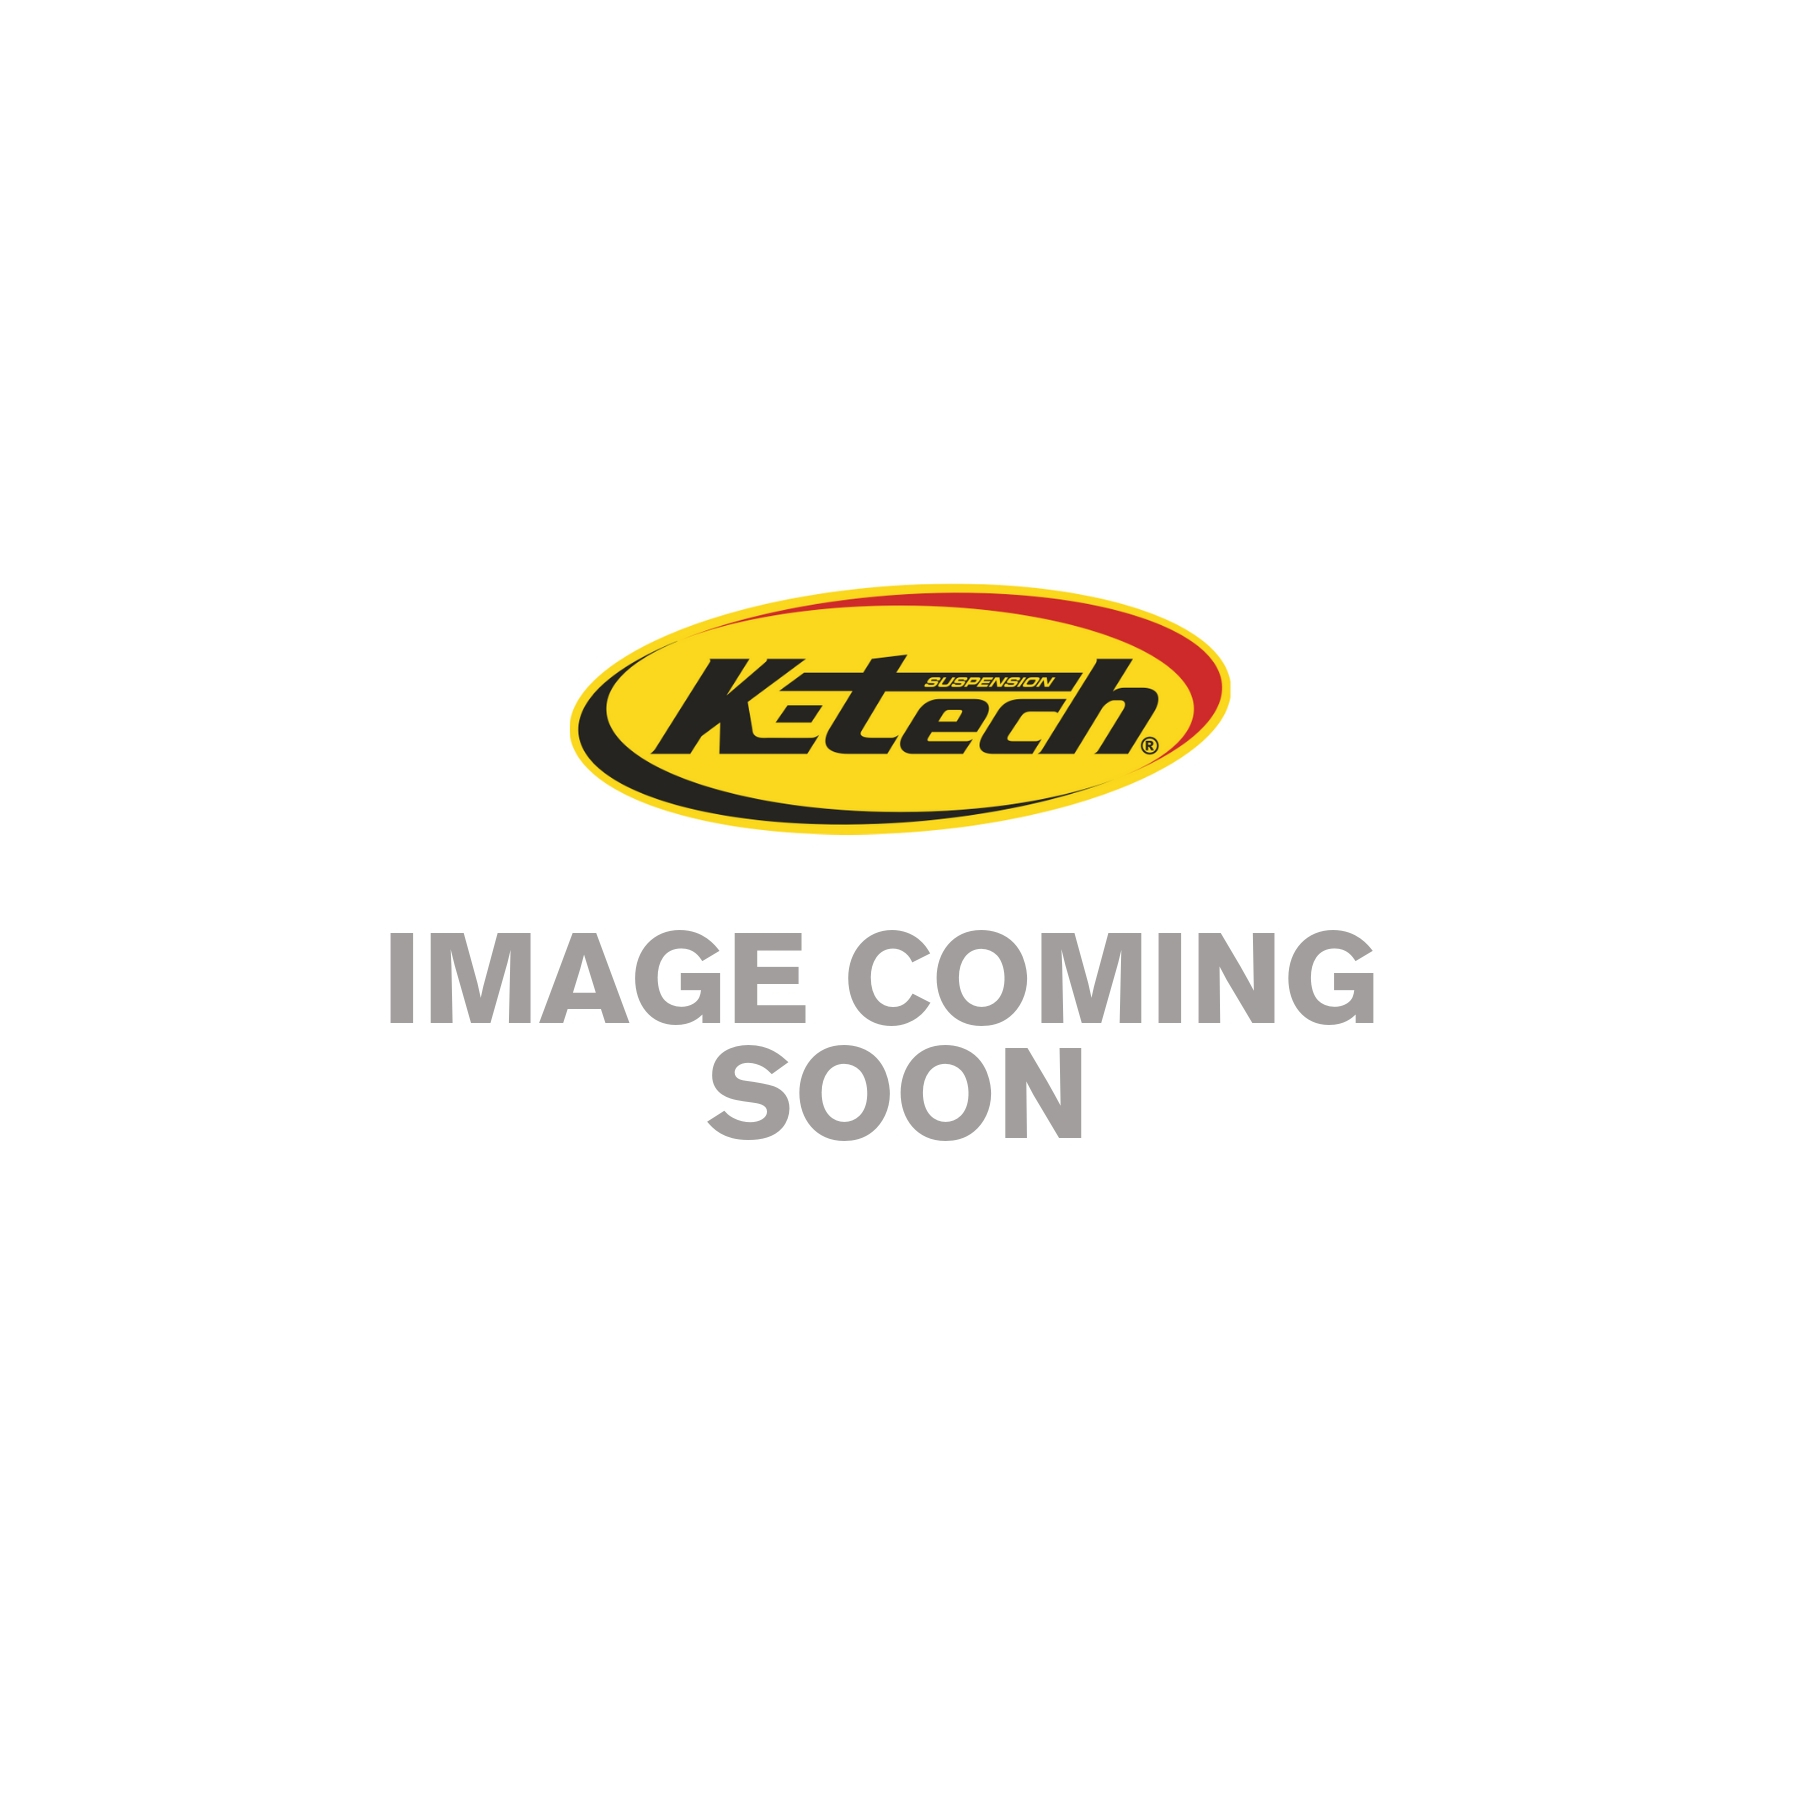 DDS Front Fork Cartridges Triumph Daytona 675 2009-2012 KYB